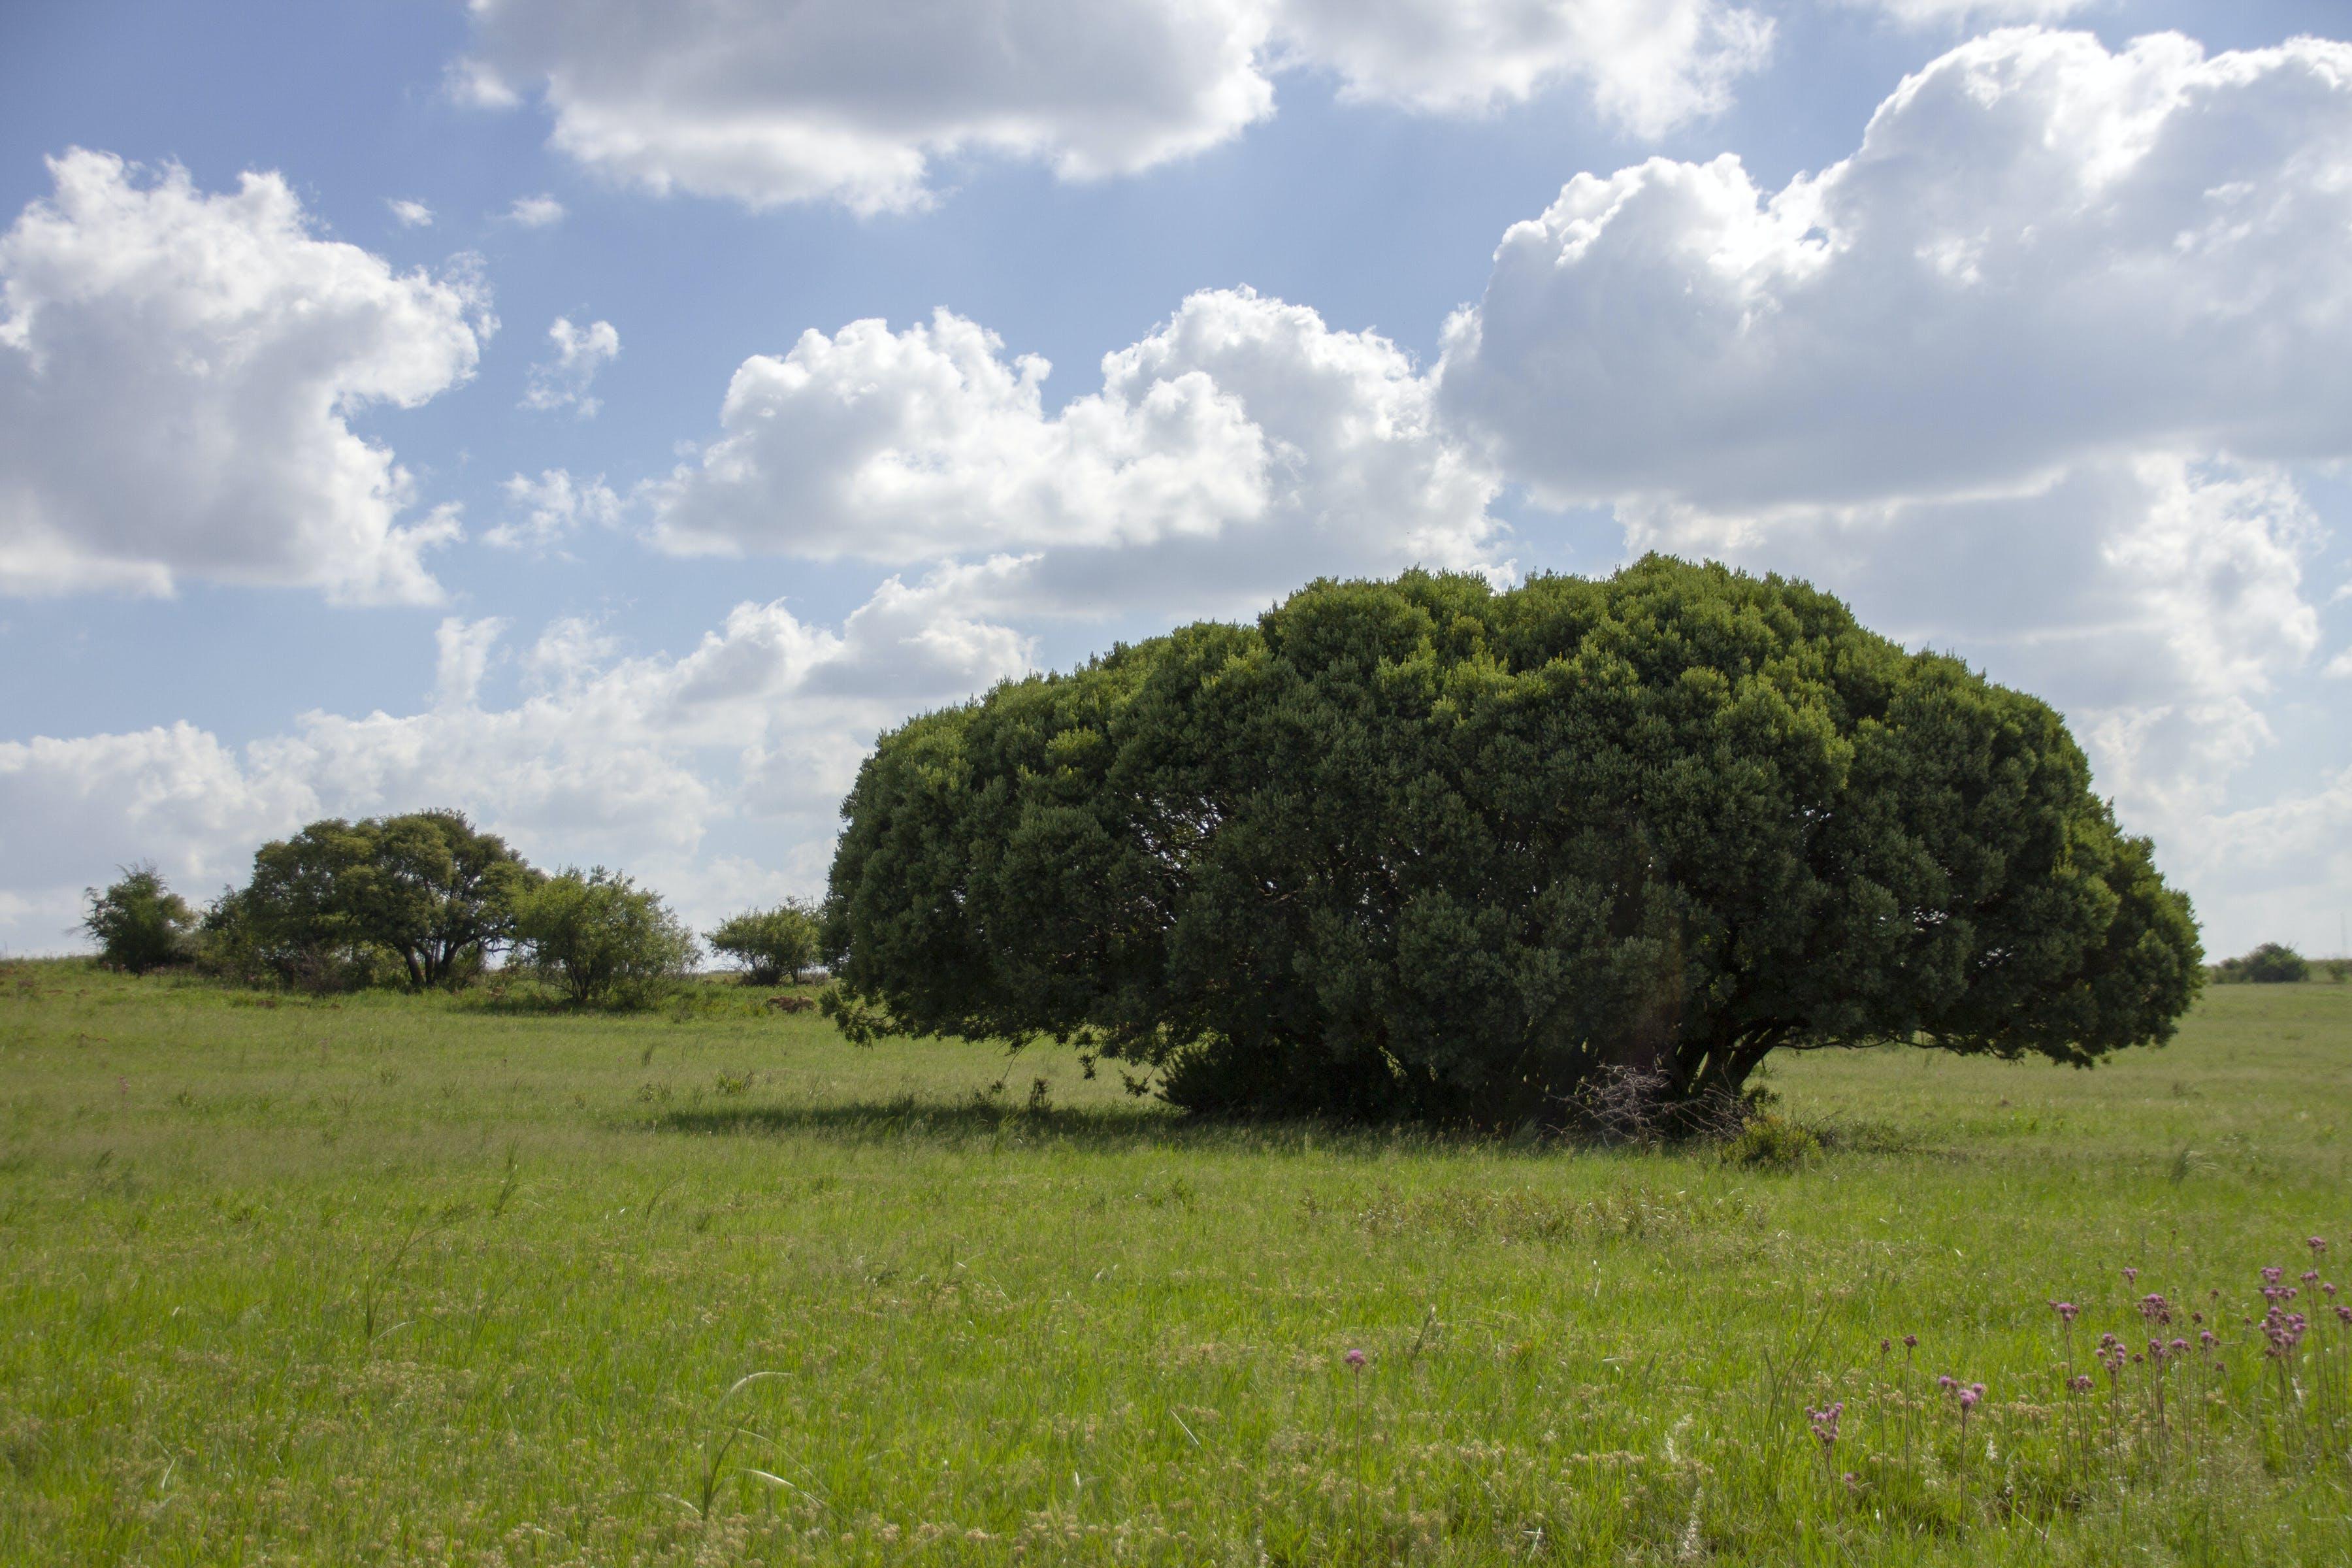 Free stock photo of tree]